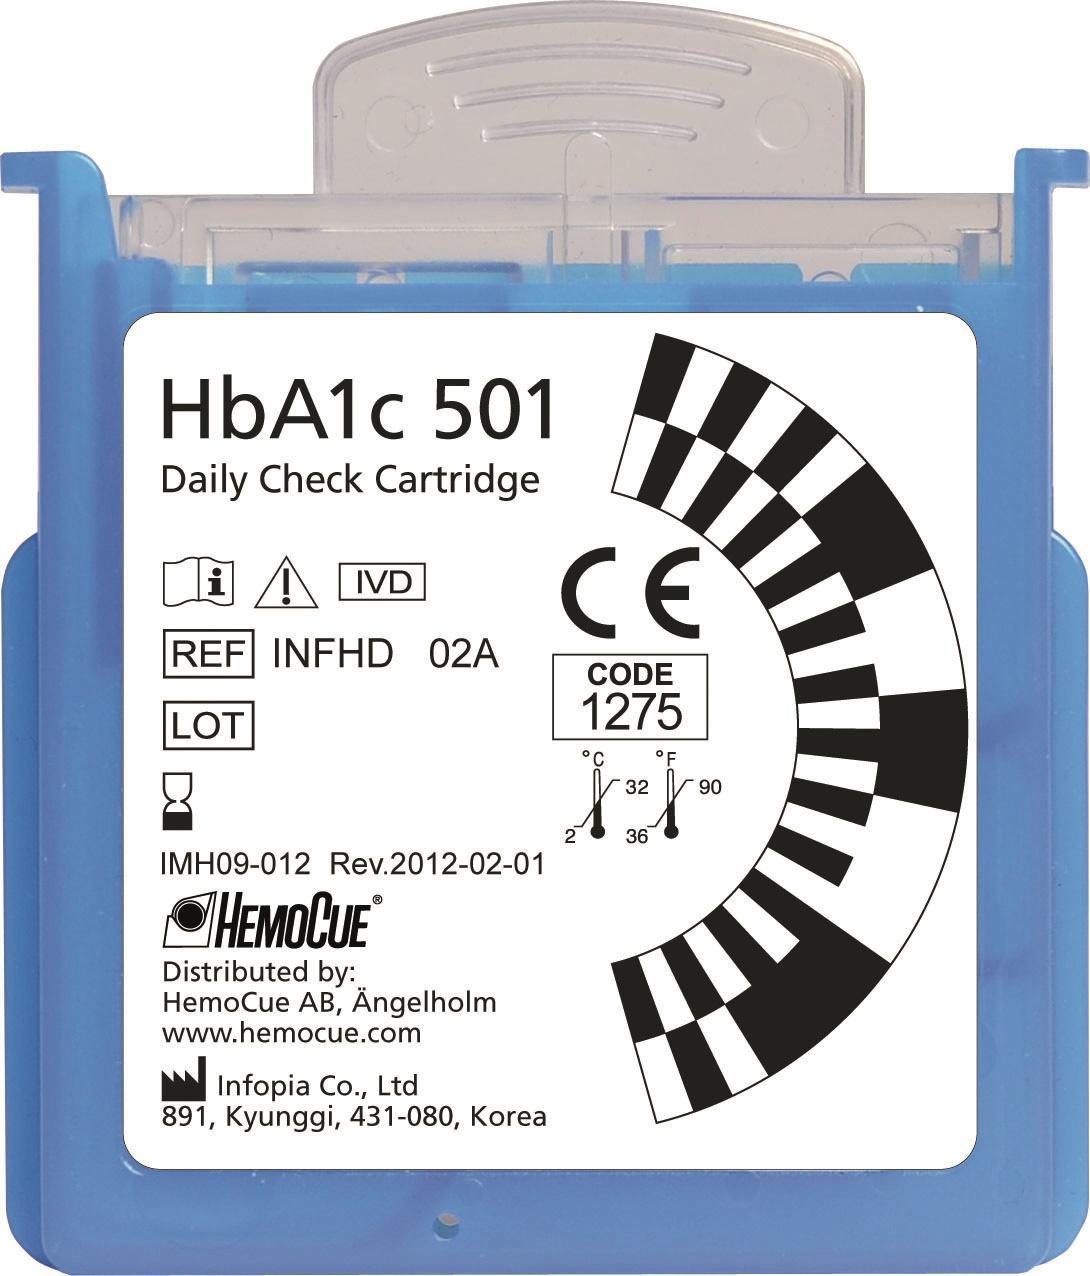 HBA1C 501 DAGLIG KONTROLL 1 ST